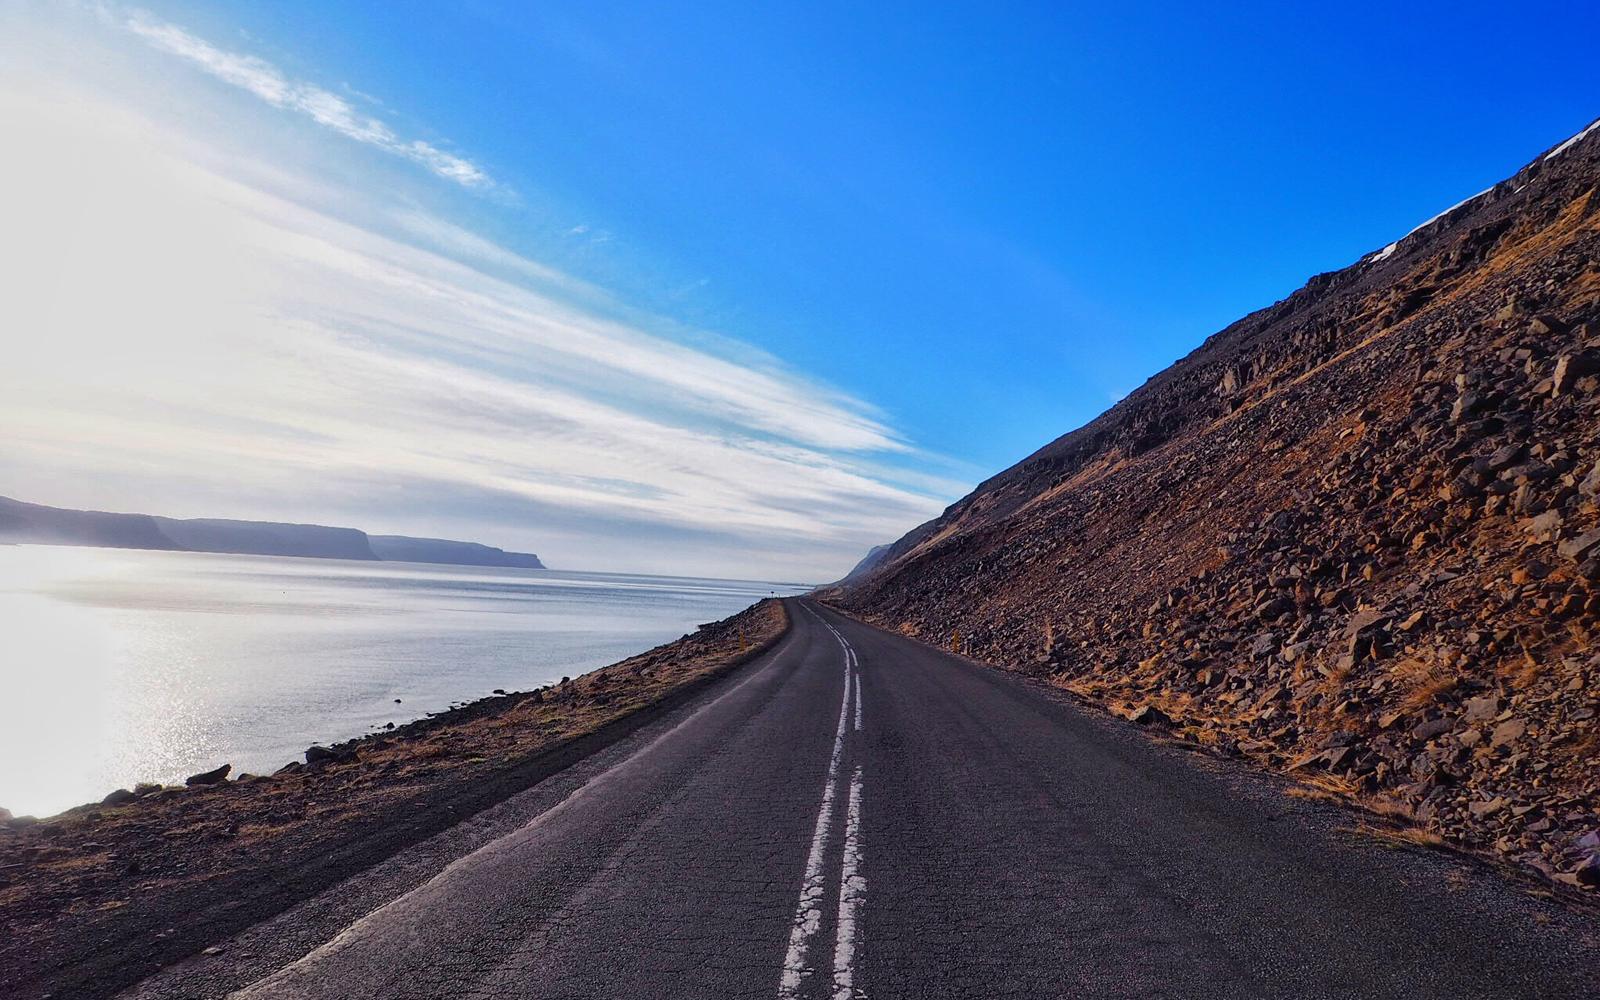 2016-iceland-latrabjarg-cliffs-03.jpg